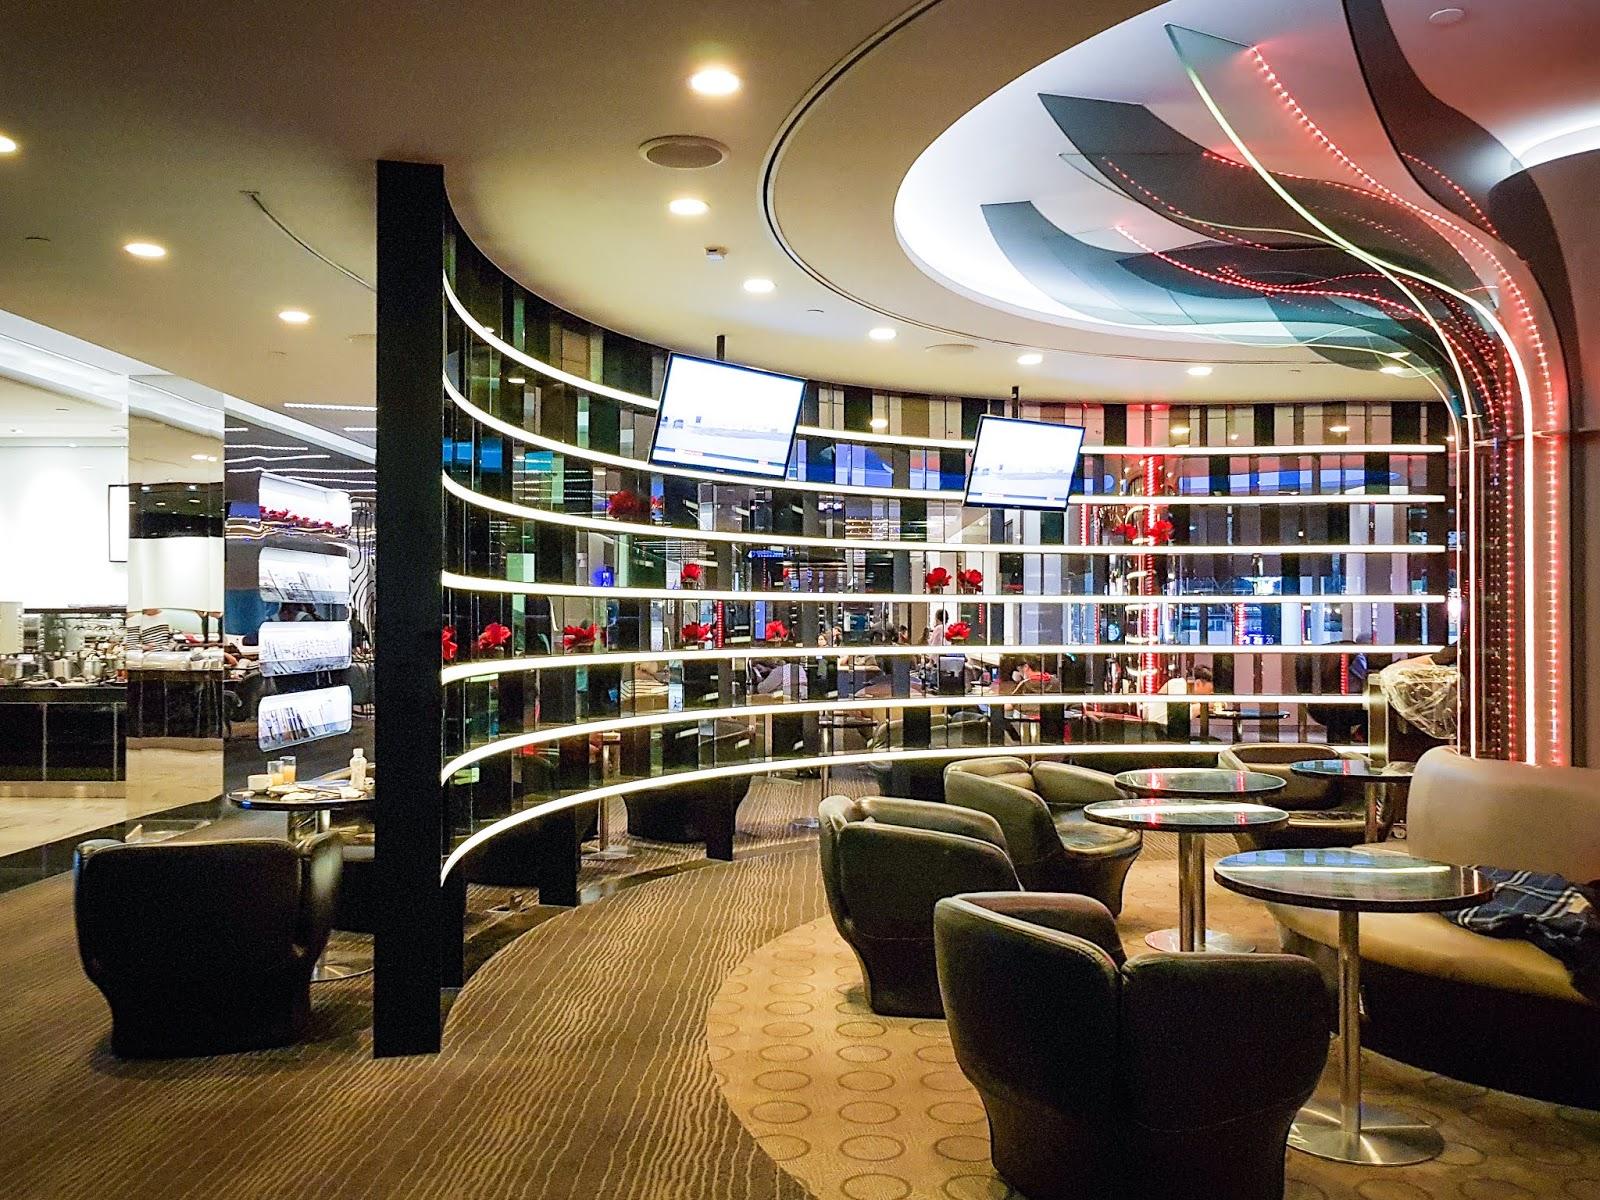 TPE|桃園機場 長榮航空貴賓室 EVA Air Lounge - The Infinity